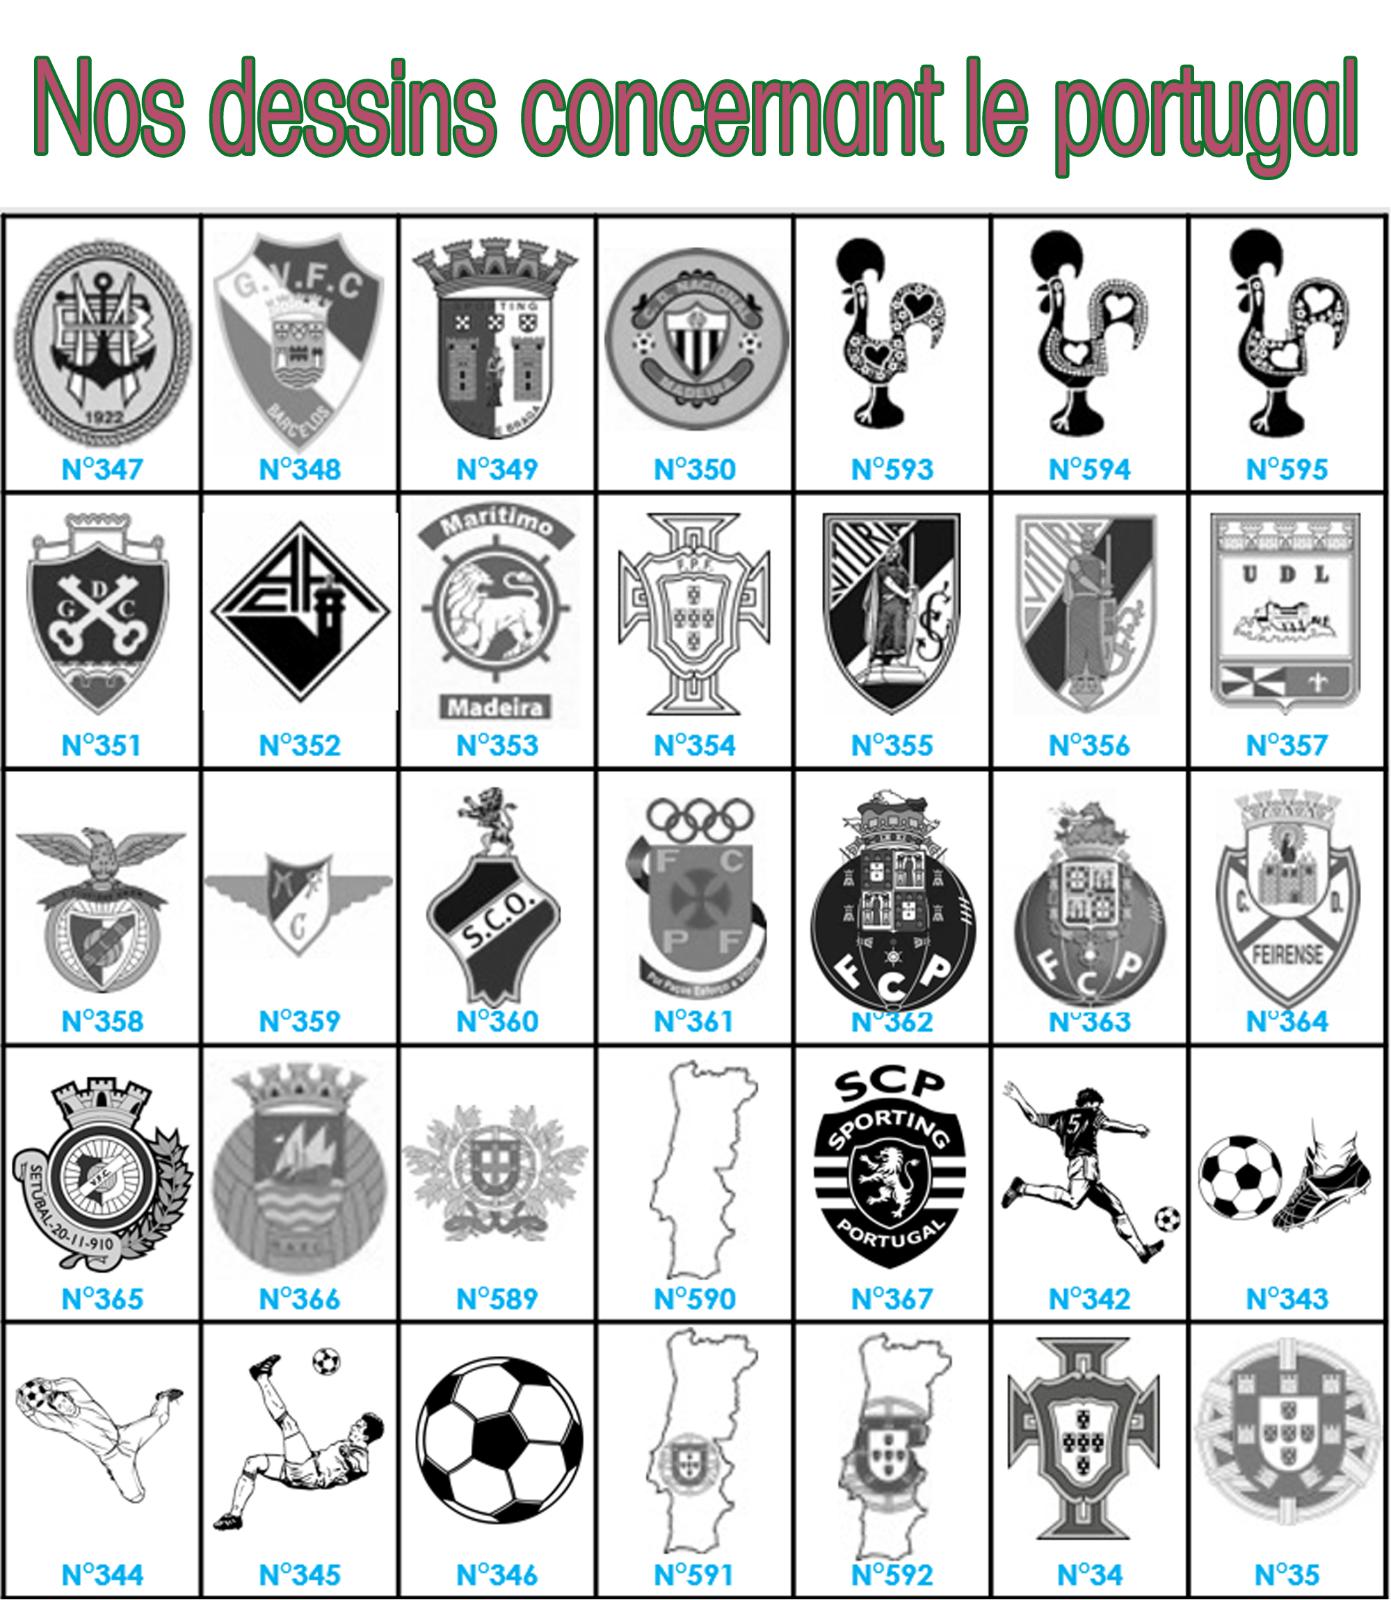 Leather wallet custom engraved vachette engraving escudo portugal flag